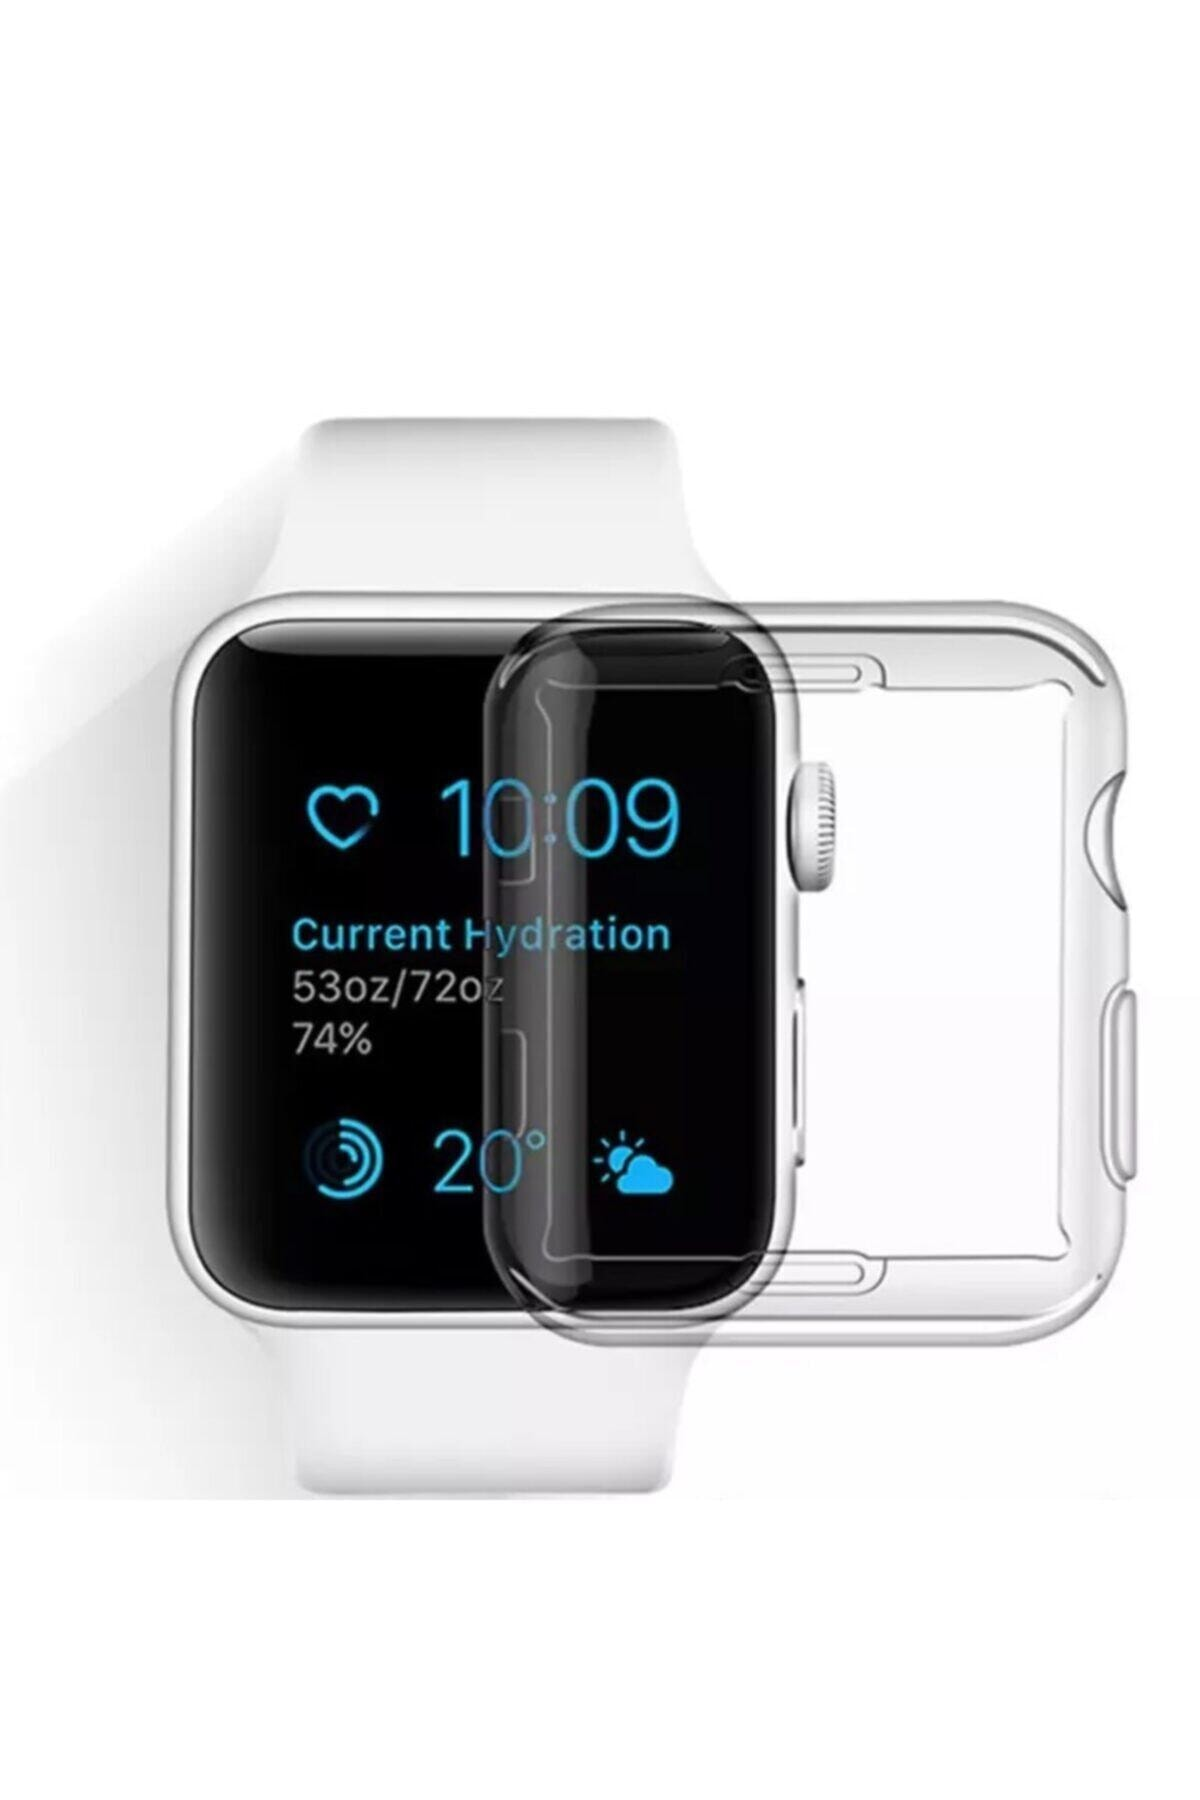 ucuzmi Apple Watch 1 2 3 4 5 6 Se Serisi ( 44mm ) 360 Tam Koruma Şeffaf Silikon Kılıf Premium Model 1